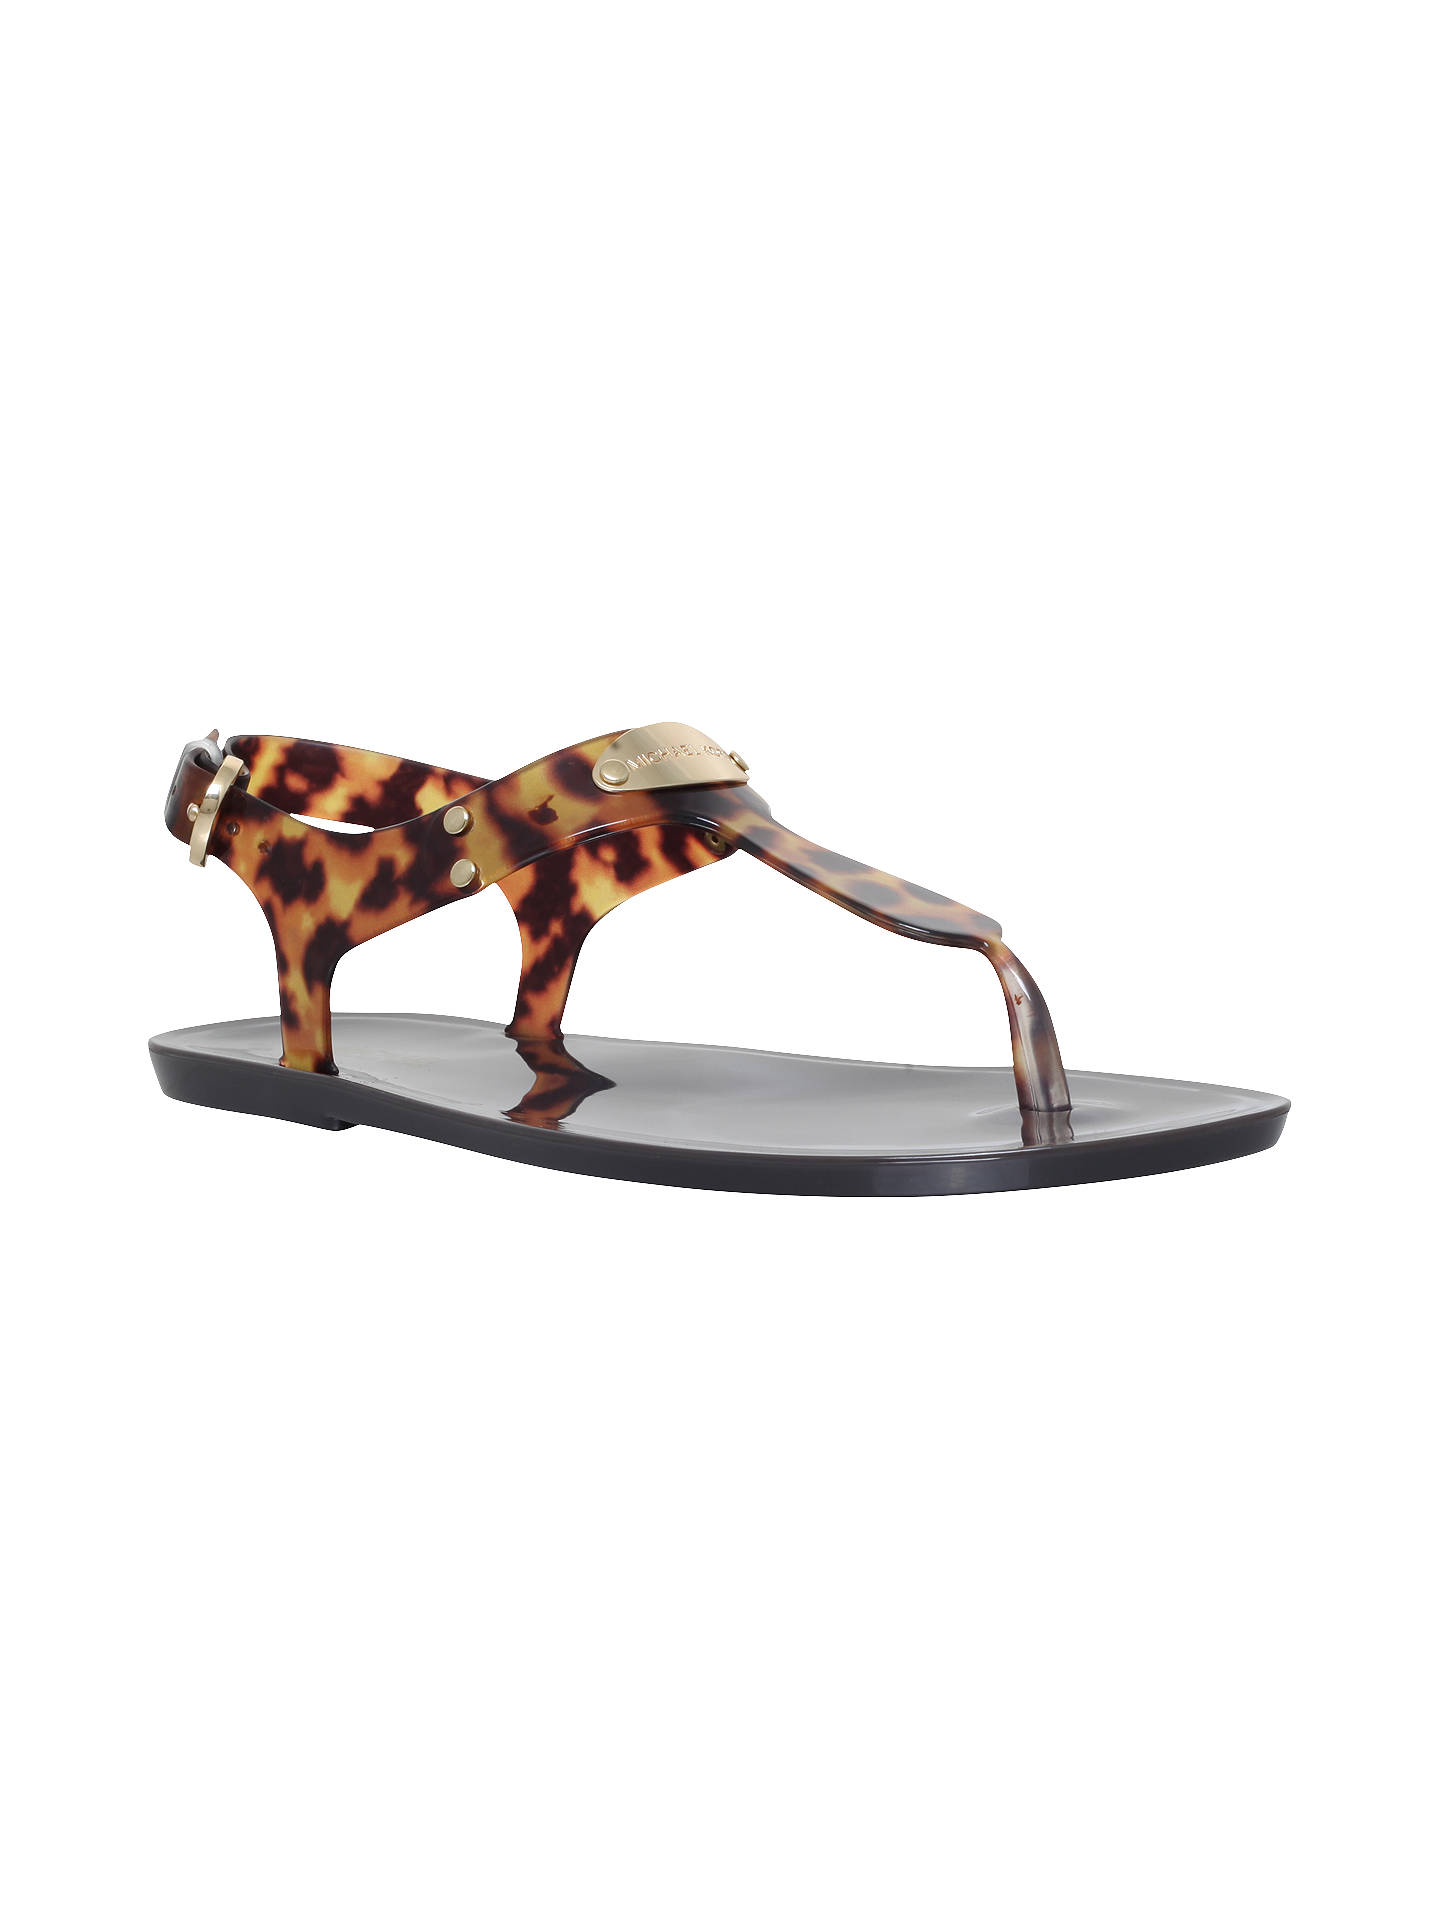 28a18706f0e2 Buy MICHAEL Michael Kors MK Plate Jelly Sandals